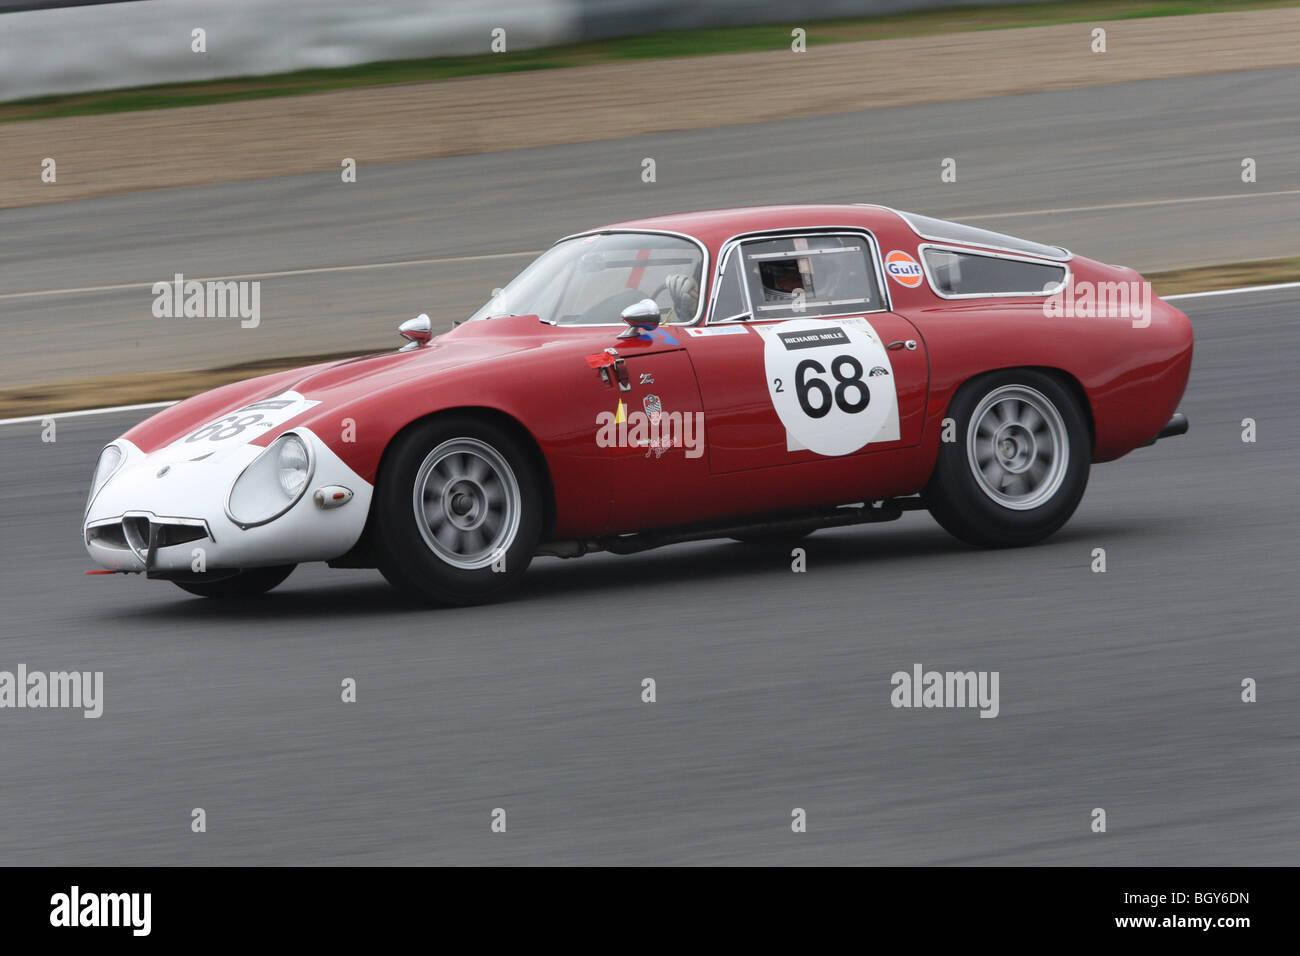 1964-Alfa Romeo TZ. Le Mans Classic Autorennen, Fuji Speedway, Japan, Sonntag, 11. November 2007. Stockbild